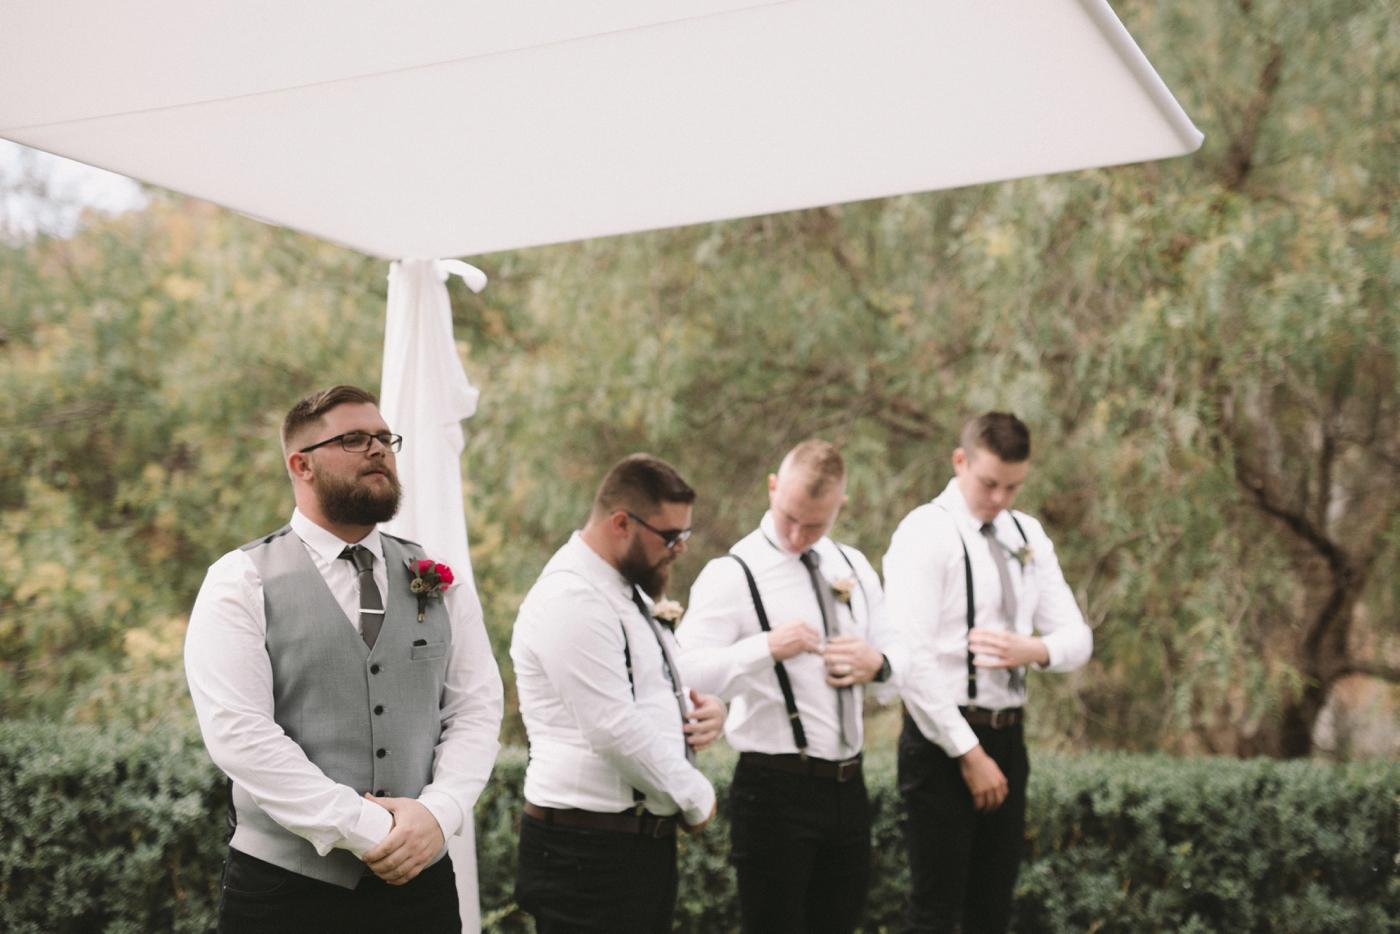 Emma & Aaron - Marybank Estate Wedding - Natural Wedding Photography in Adelaide - www.katherineschultzphotography.com_0029.jpg